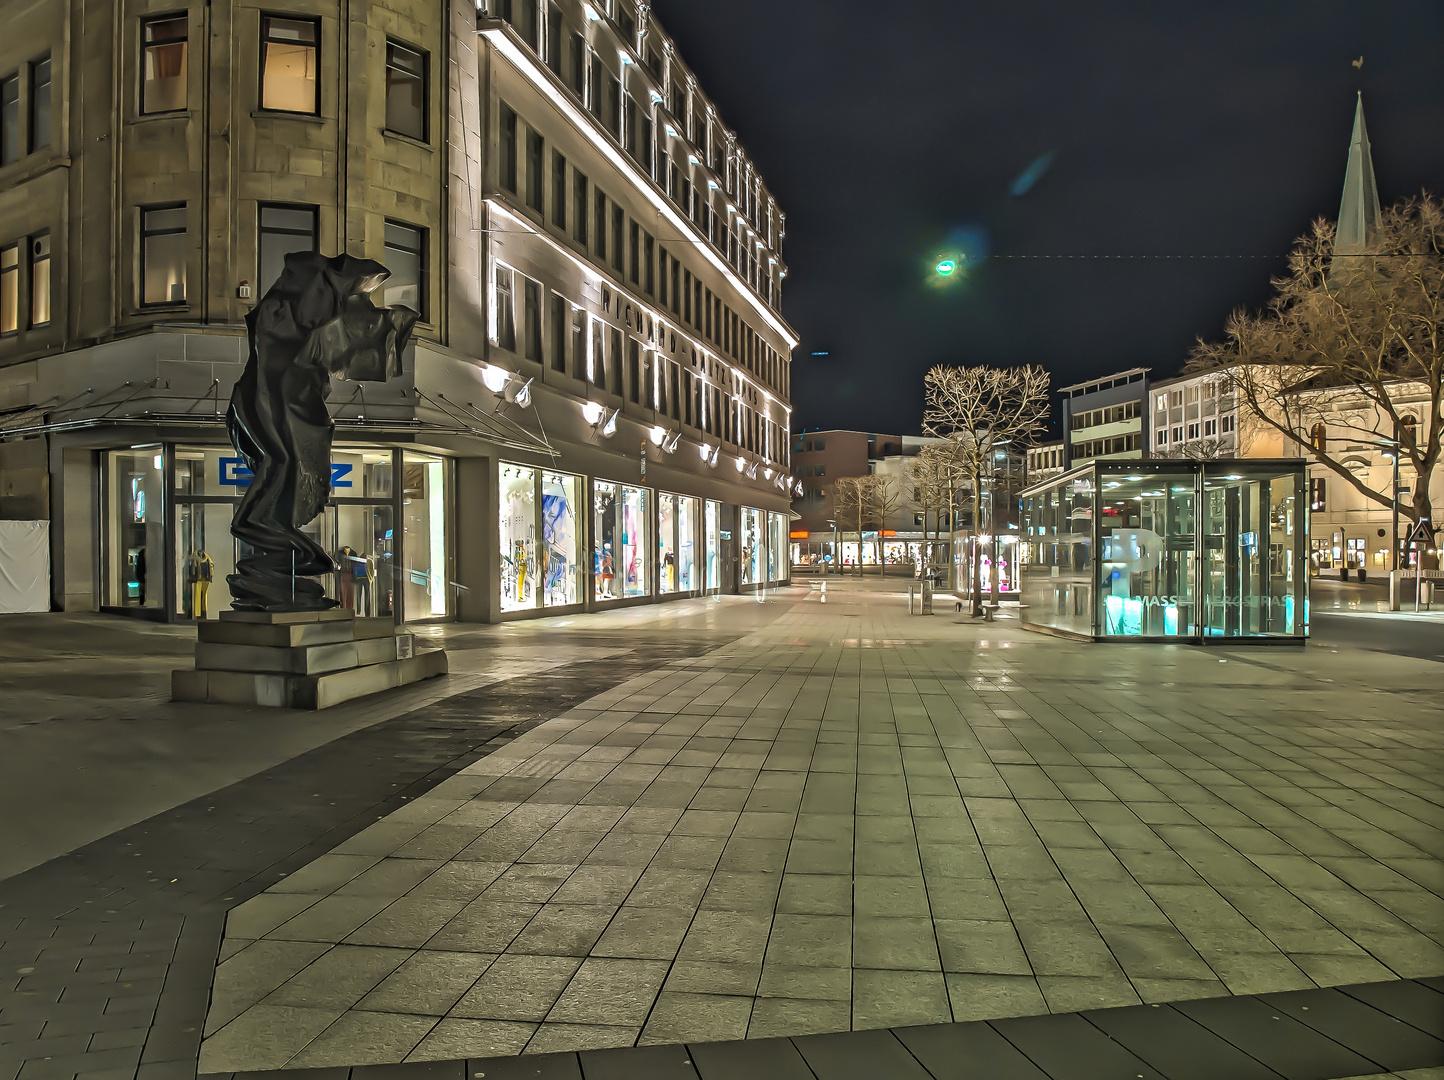 Bongardstrasse Bochum